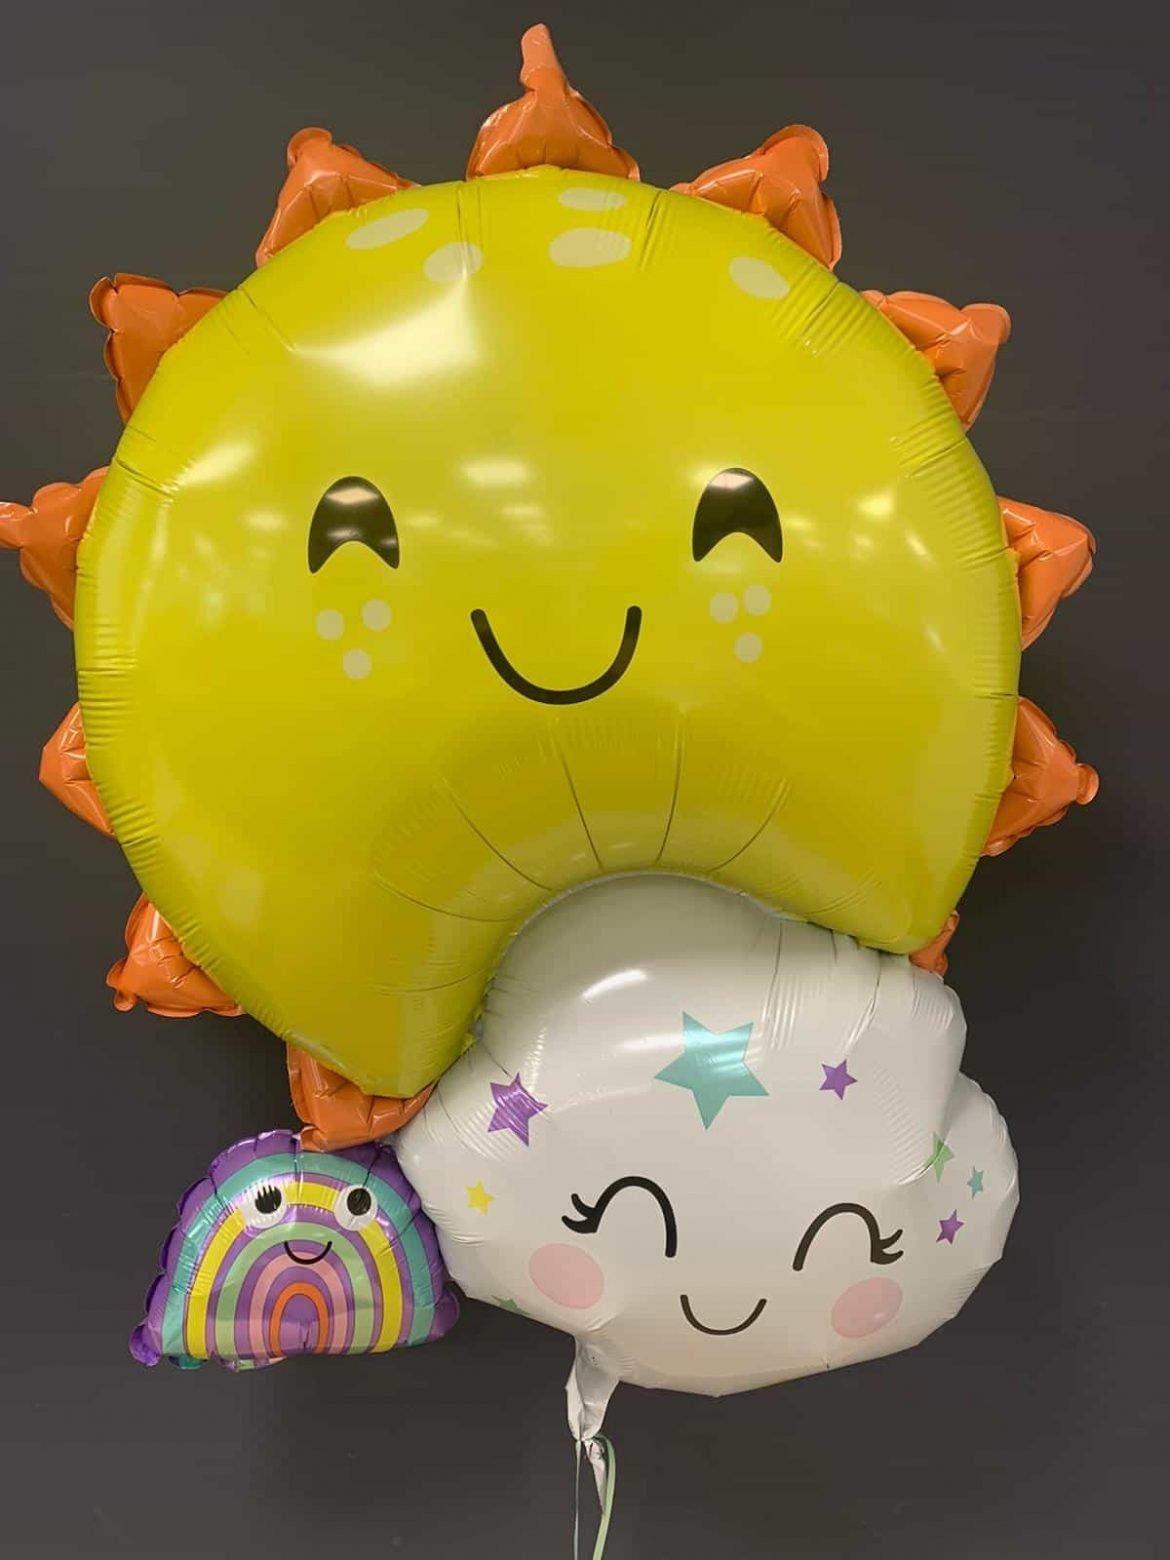 Ballon Sonne € 7,90 1